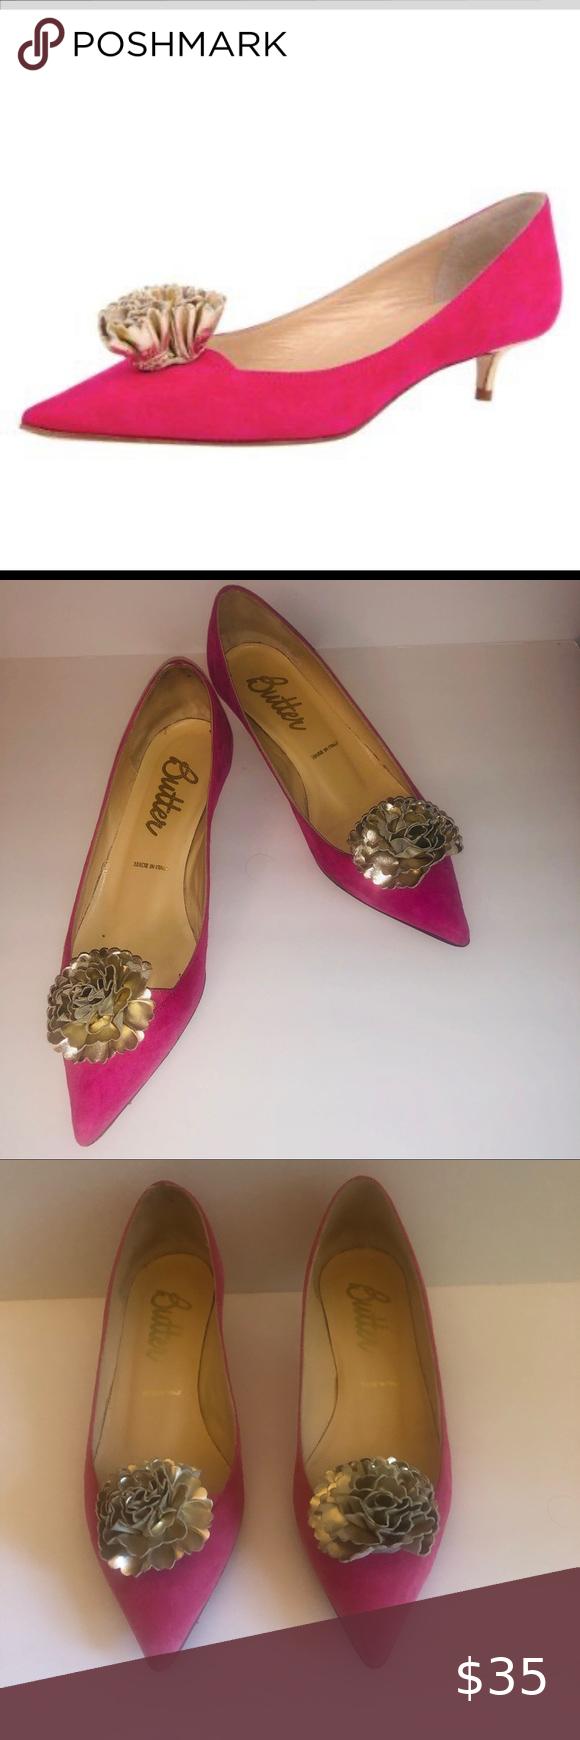 Super Cute Preppy Butter Pink Kitten Heel Shoes In 2020 Pink Kitten Heels Kitten Heel Shoes Gold Kitten Heels